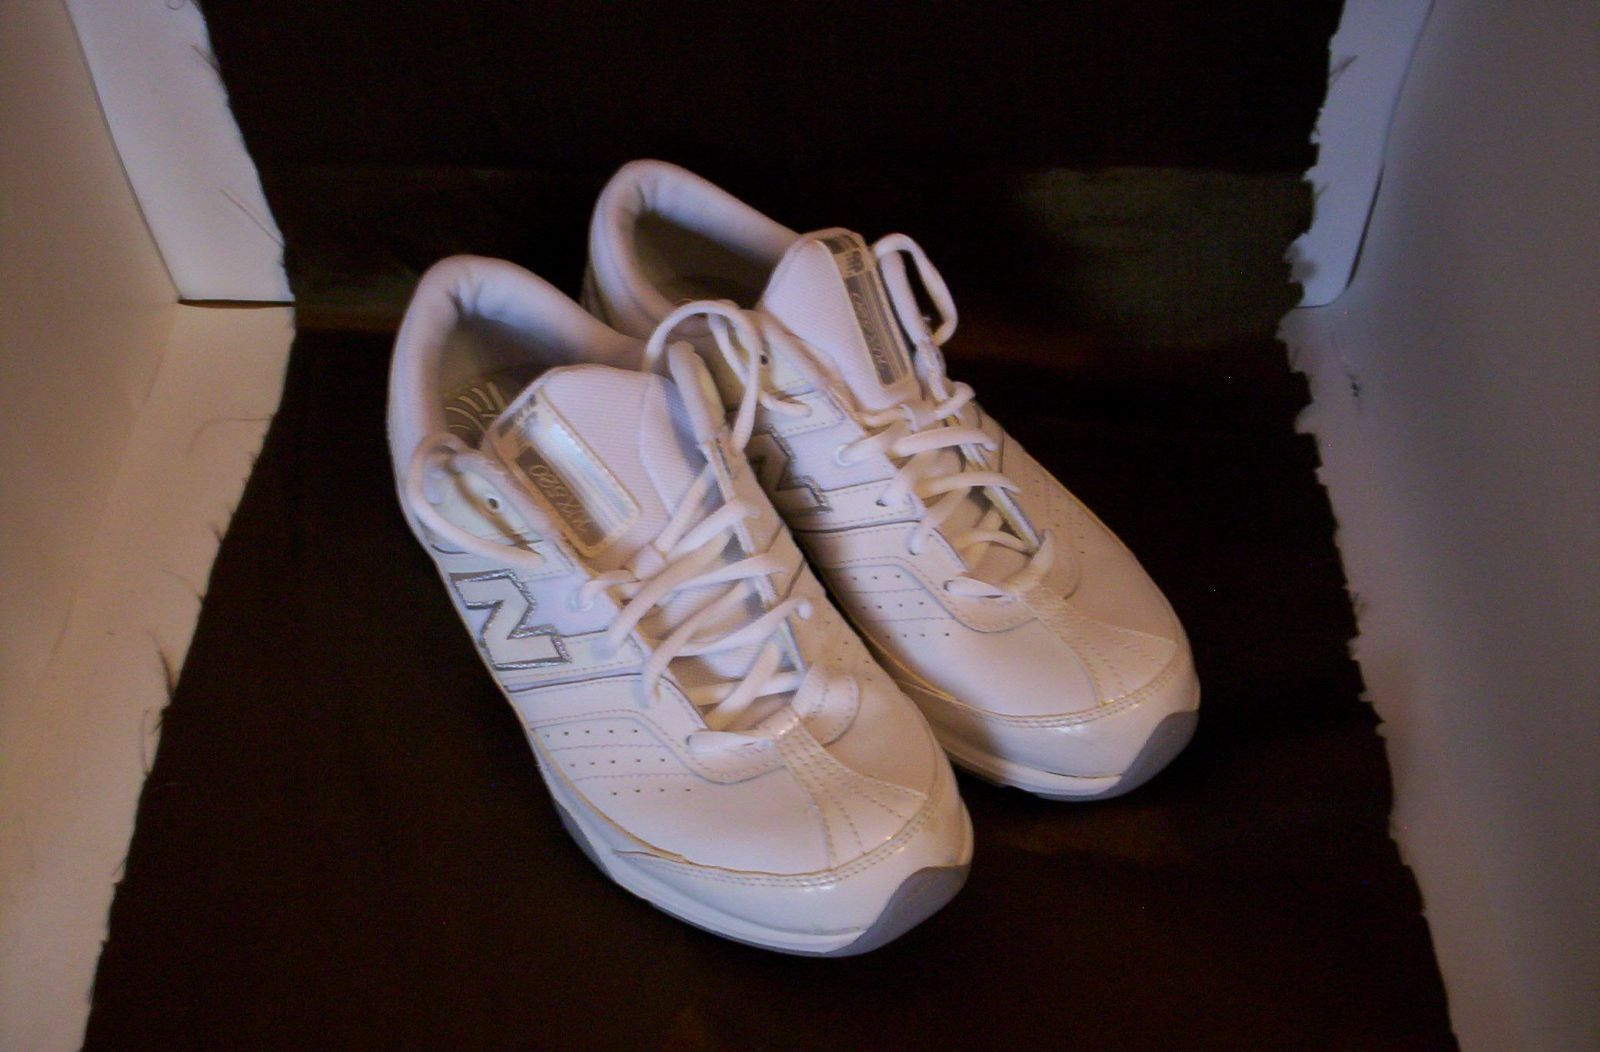 Women's New Balance 520 Cross Training shoes - Size 10B - WX520WS